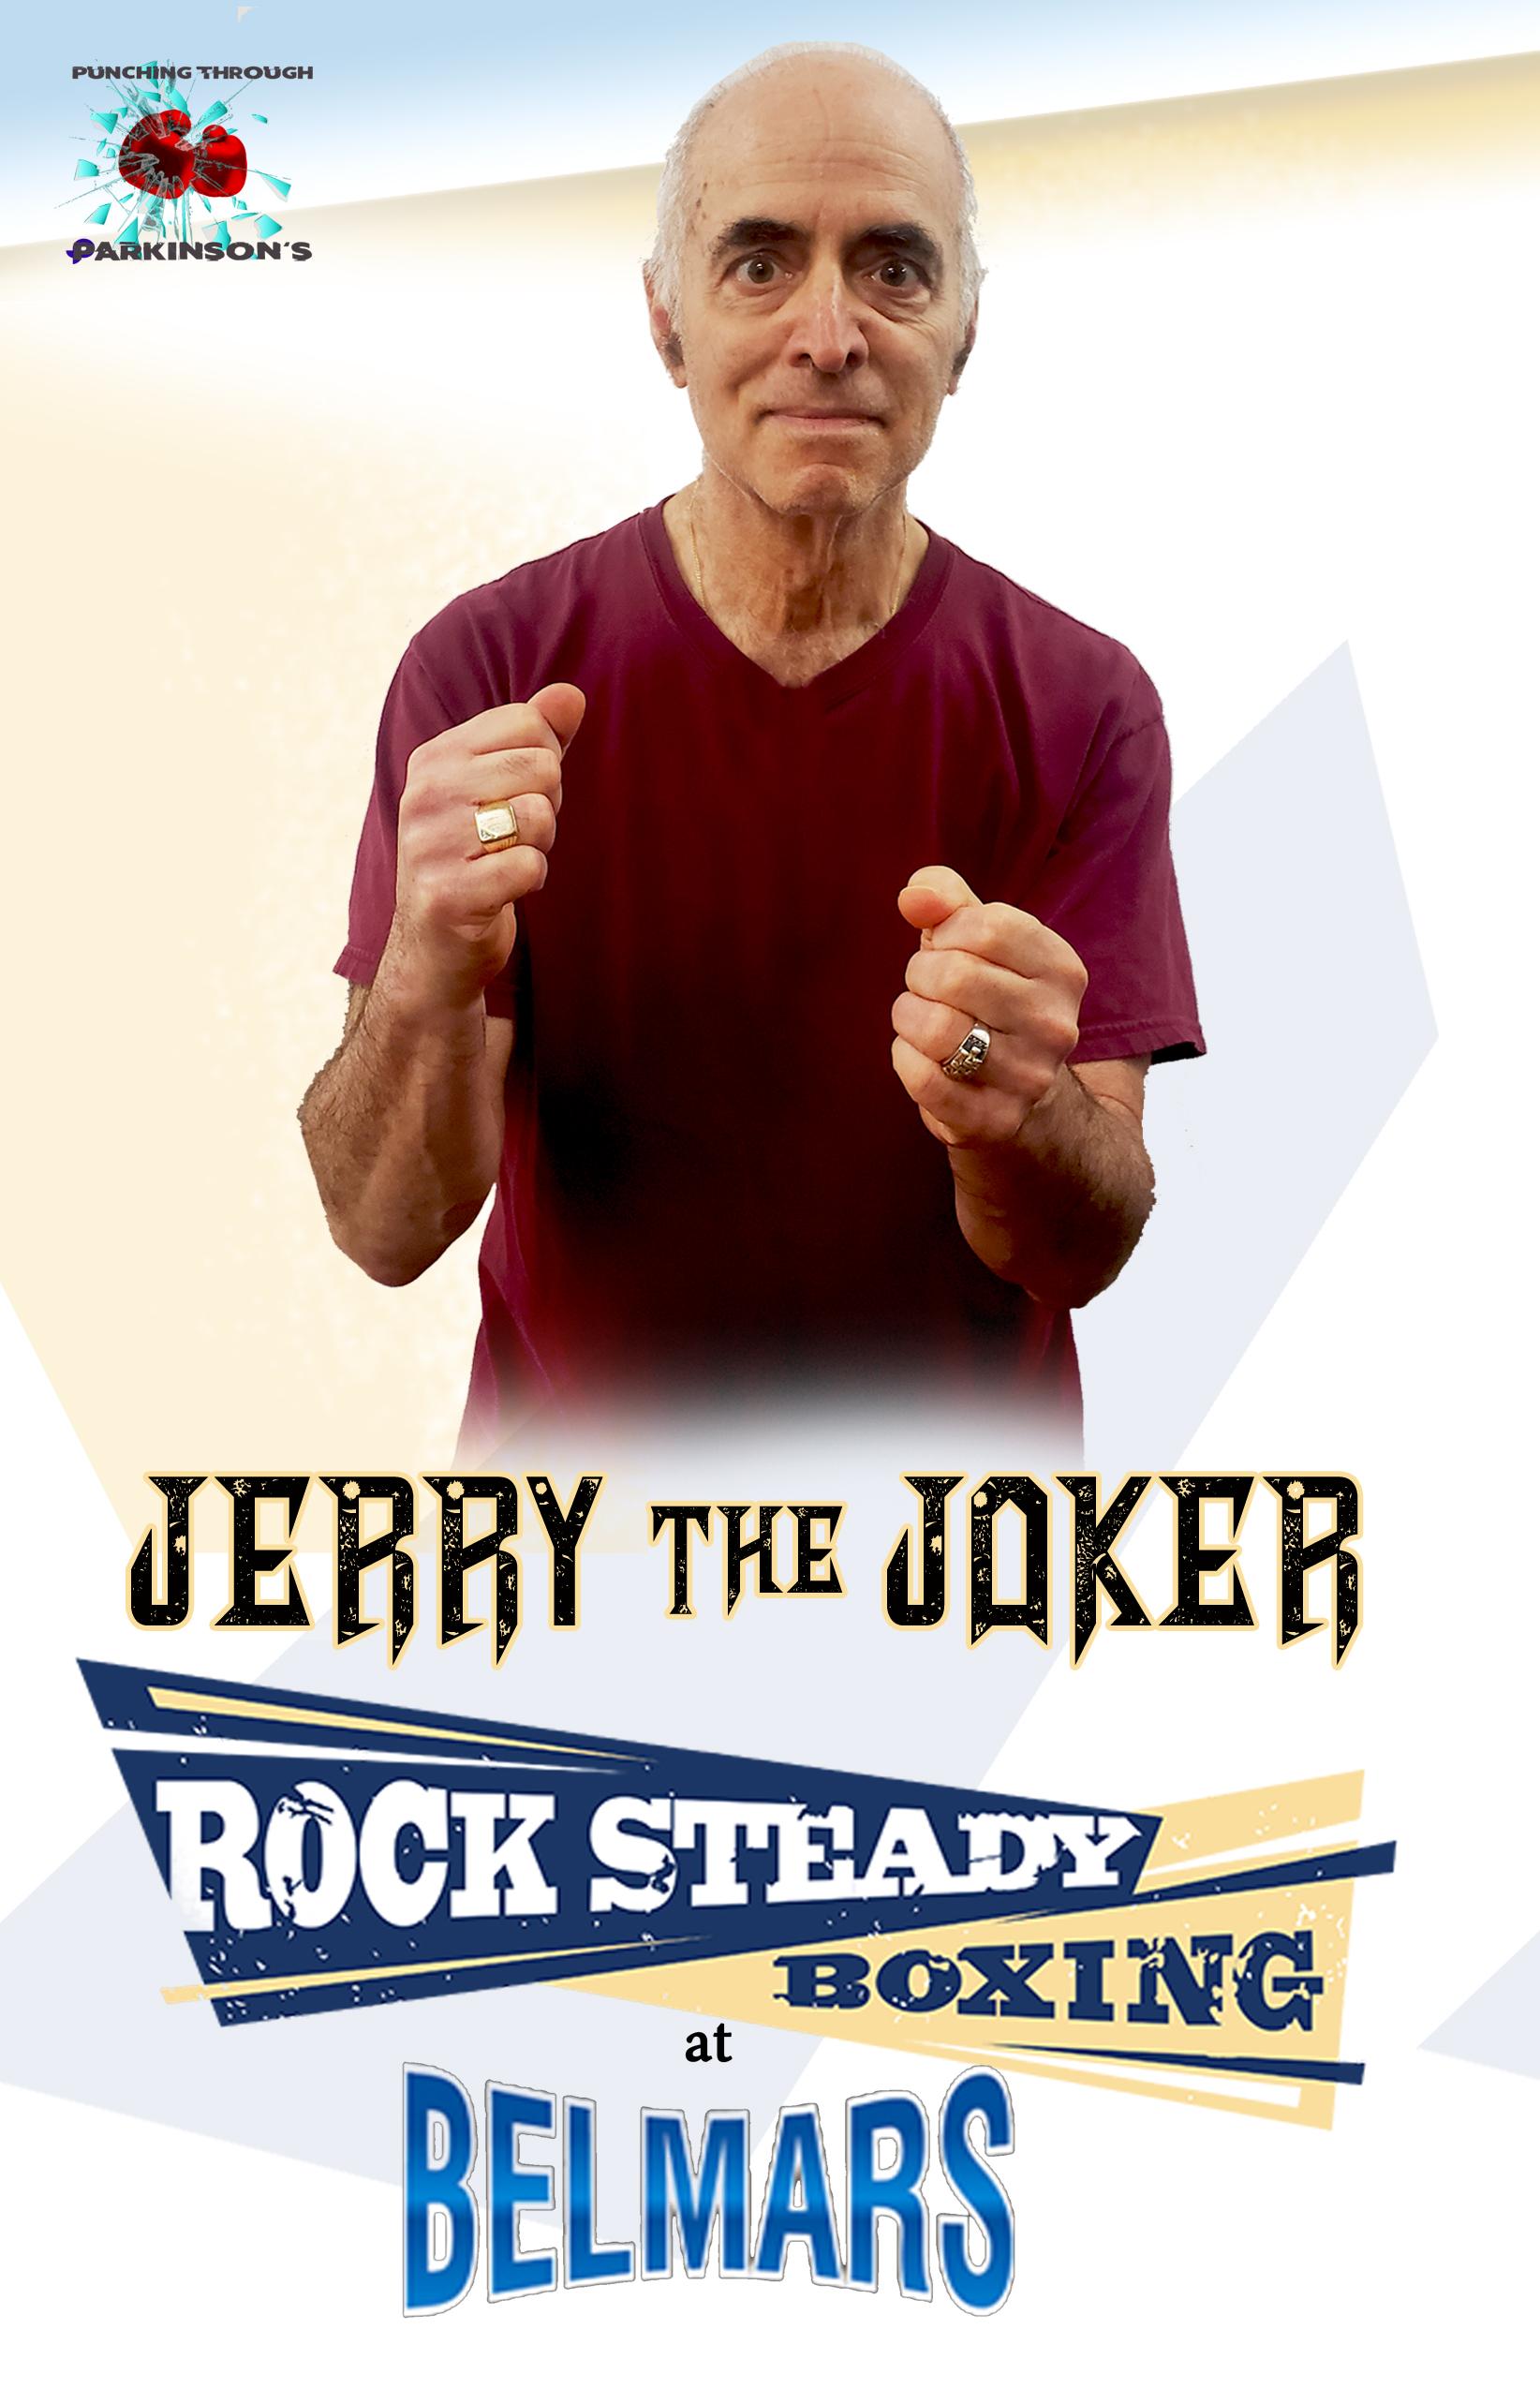 RSA Jerry